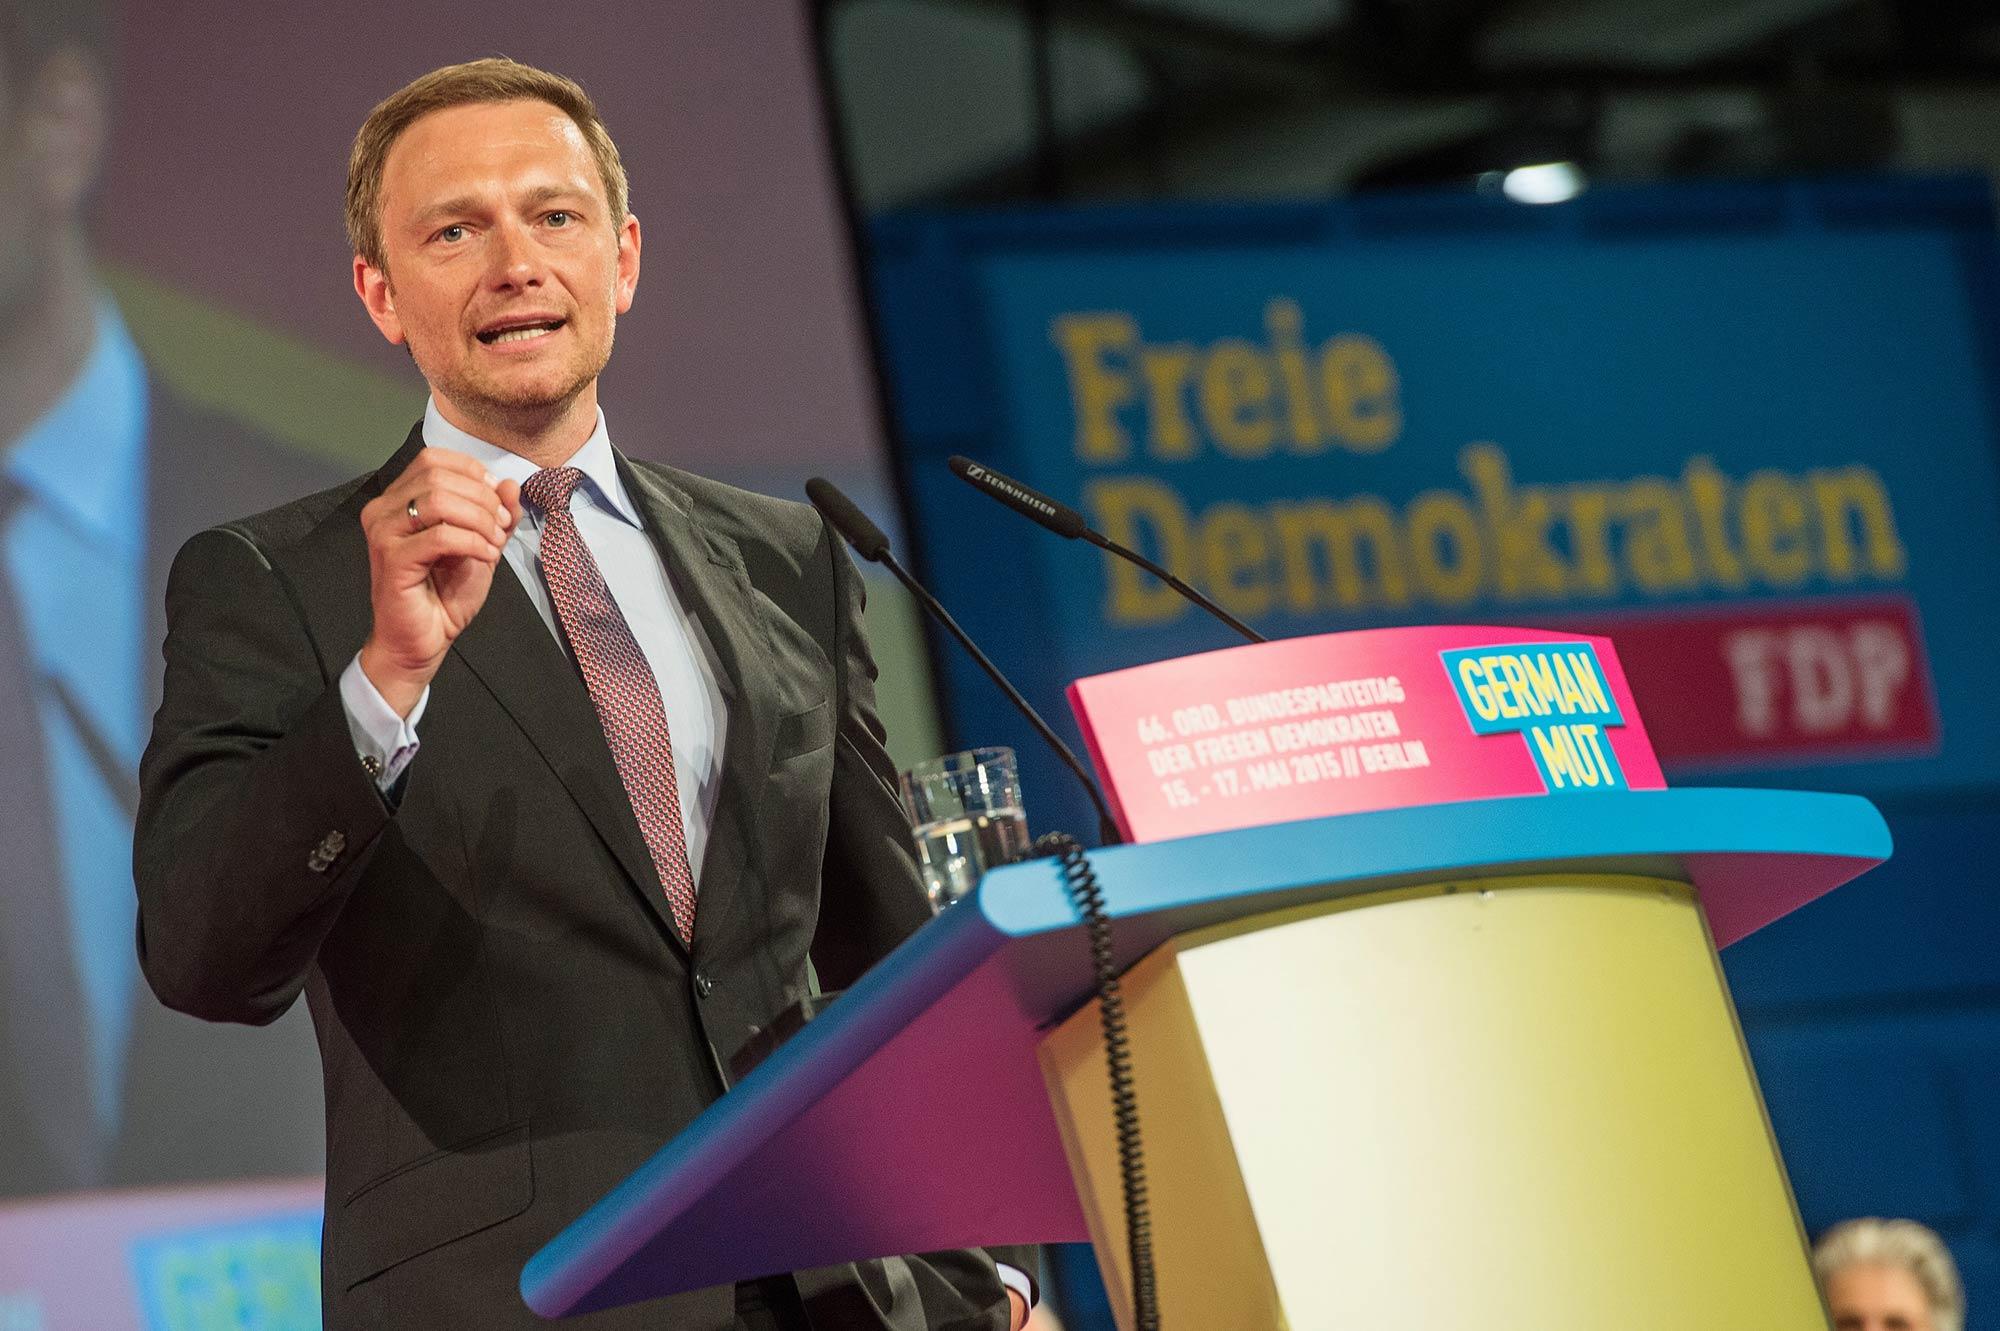 Porträt Christian Lindner, Bundesvorsitzender der FDP